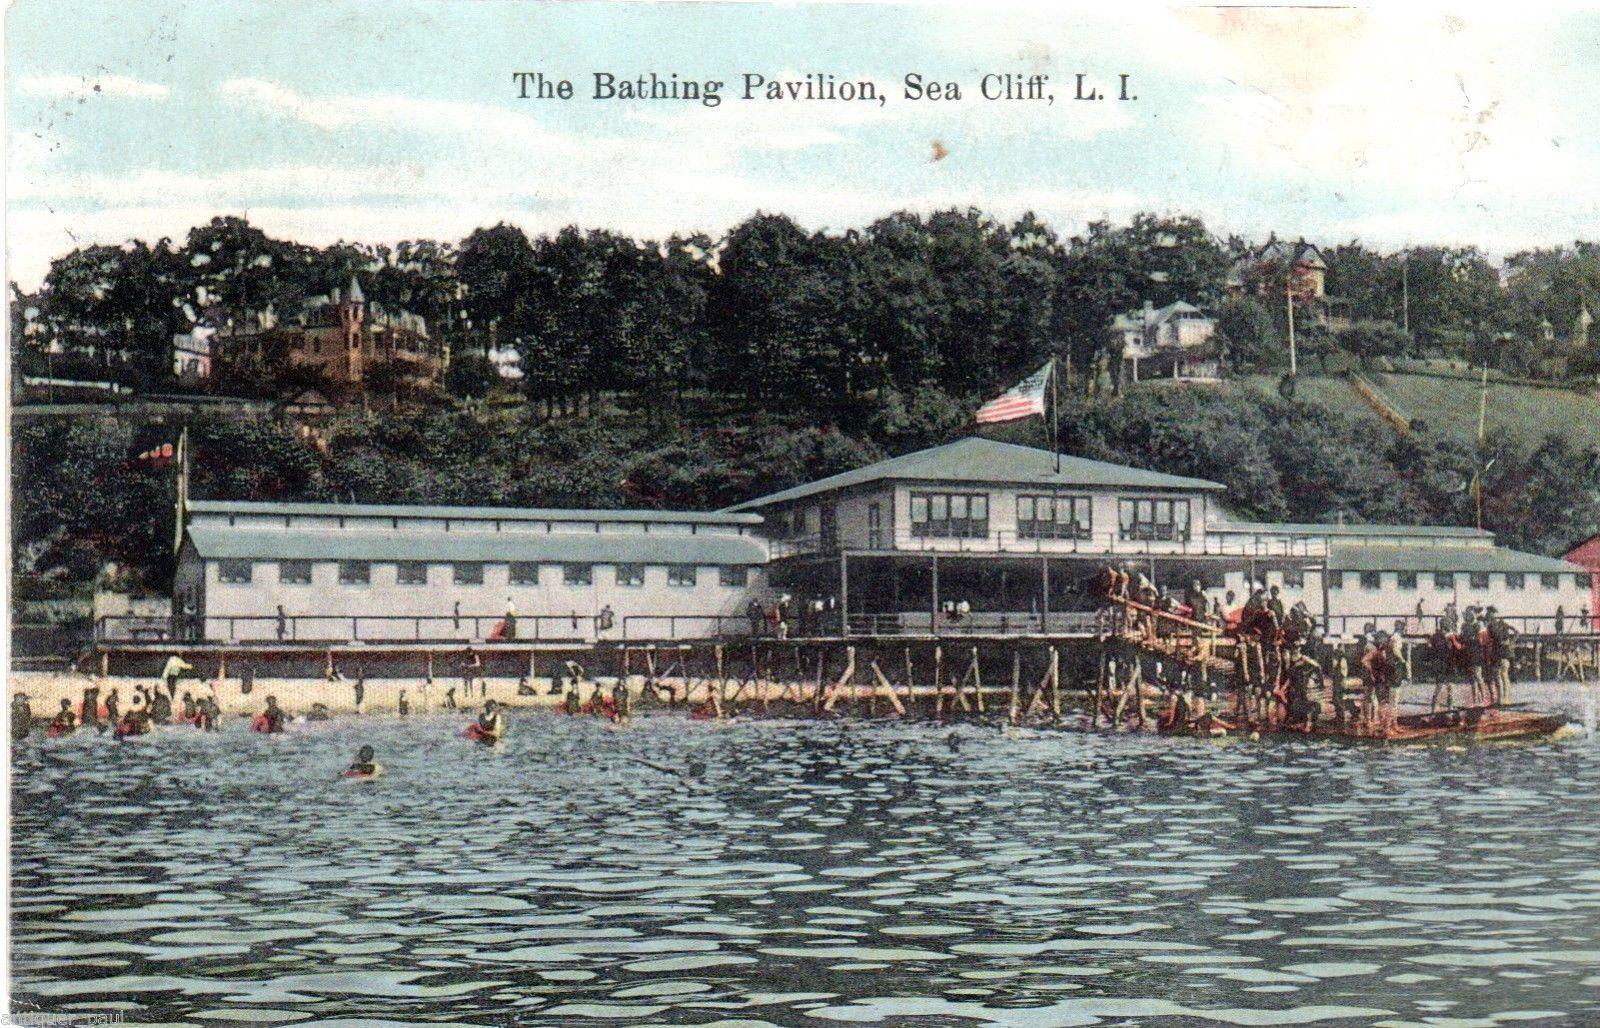 eac4ecff0c5b9354f286e7e5a299f5be - Monmouth Beach Bathing Pavilion Application